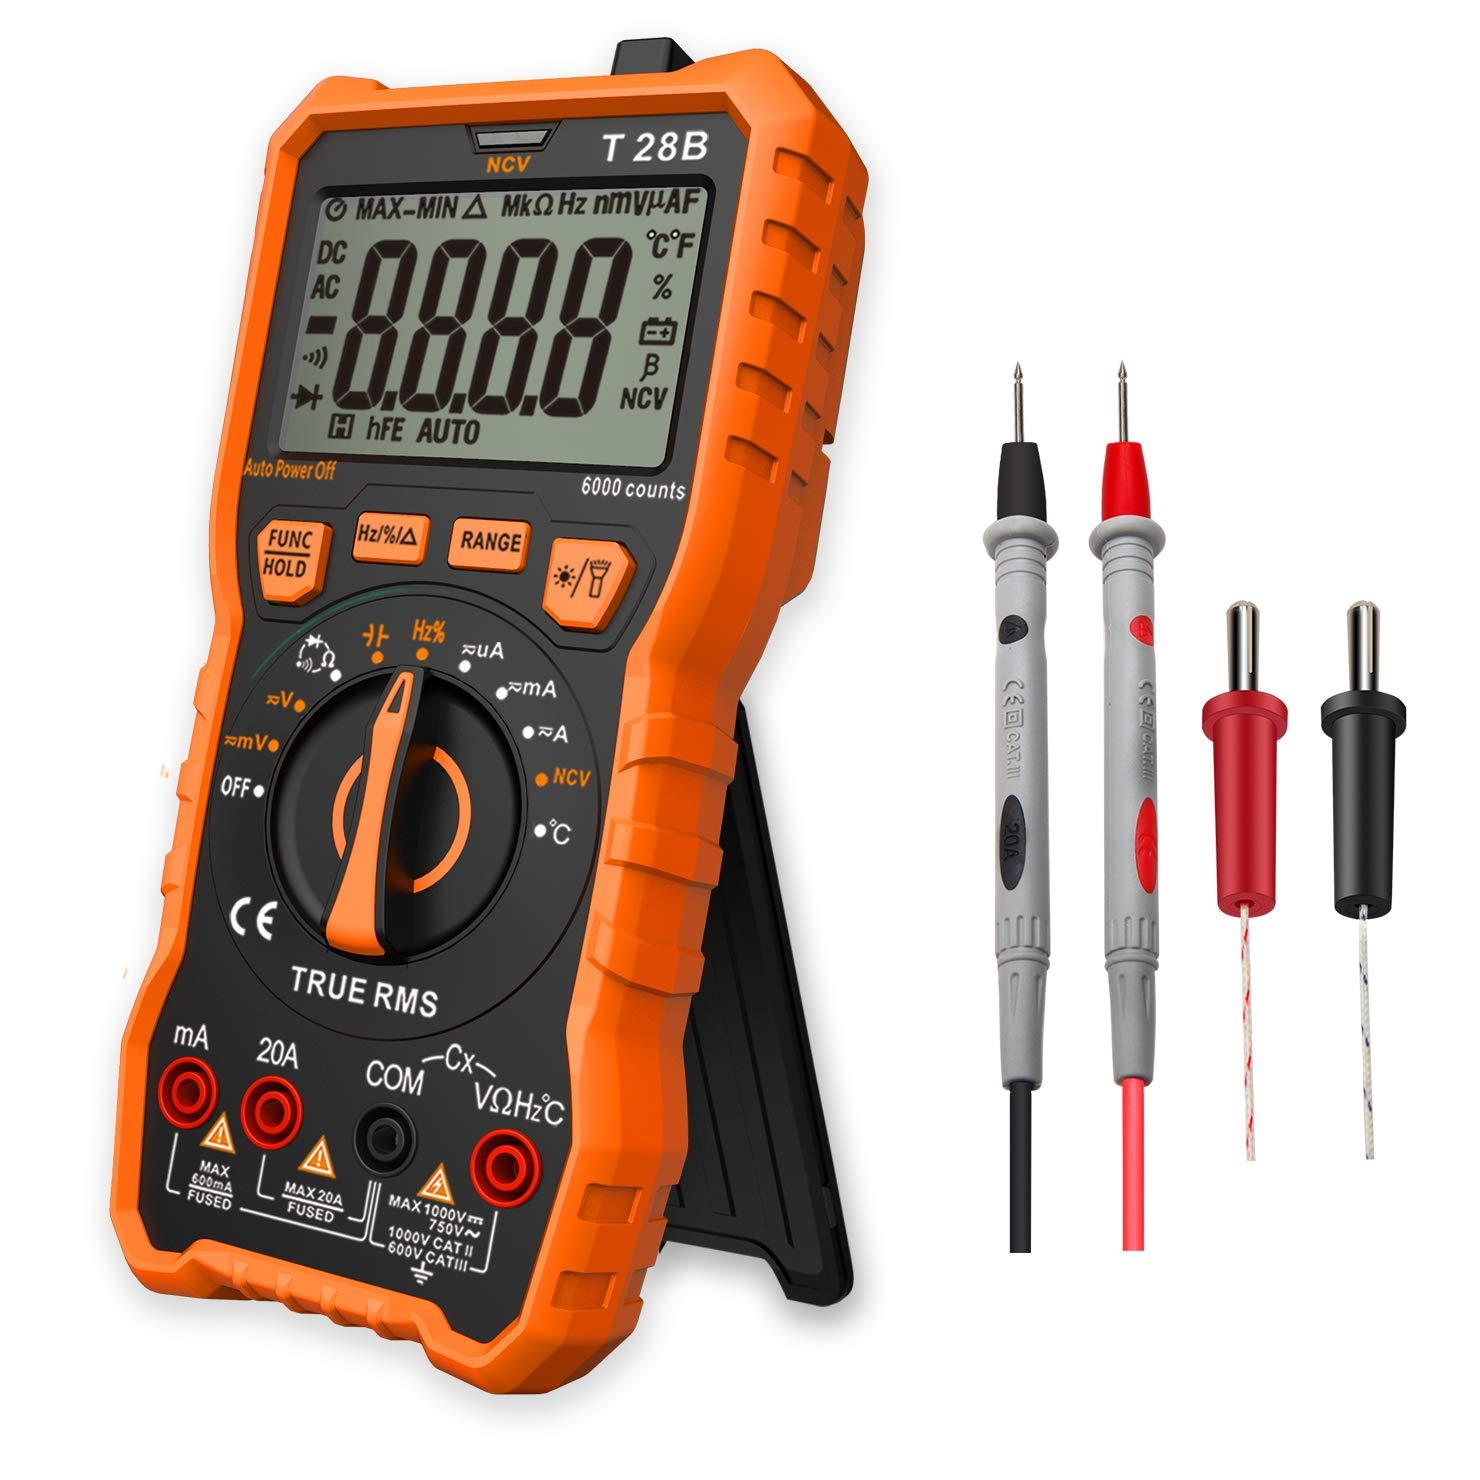 Digital Multimeter Messgerä t, LOMVUM T28B 6000 Counts Auto Range Multimeter True RMS